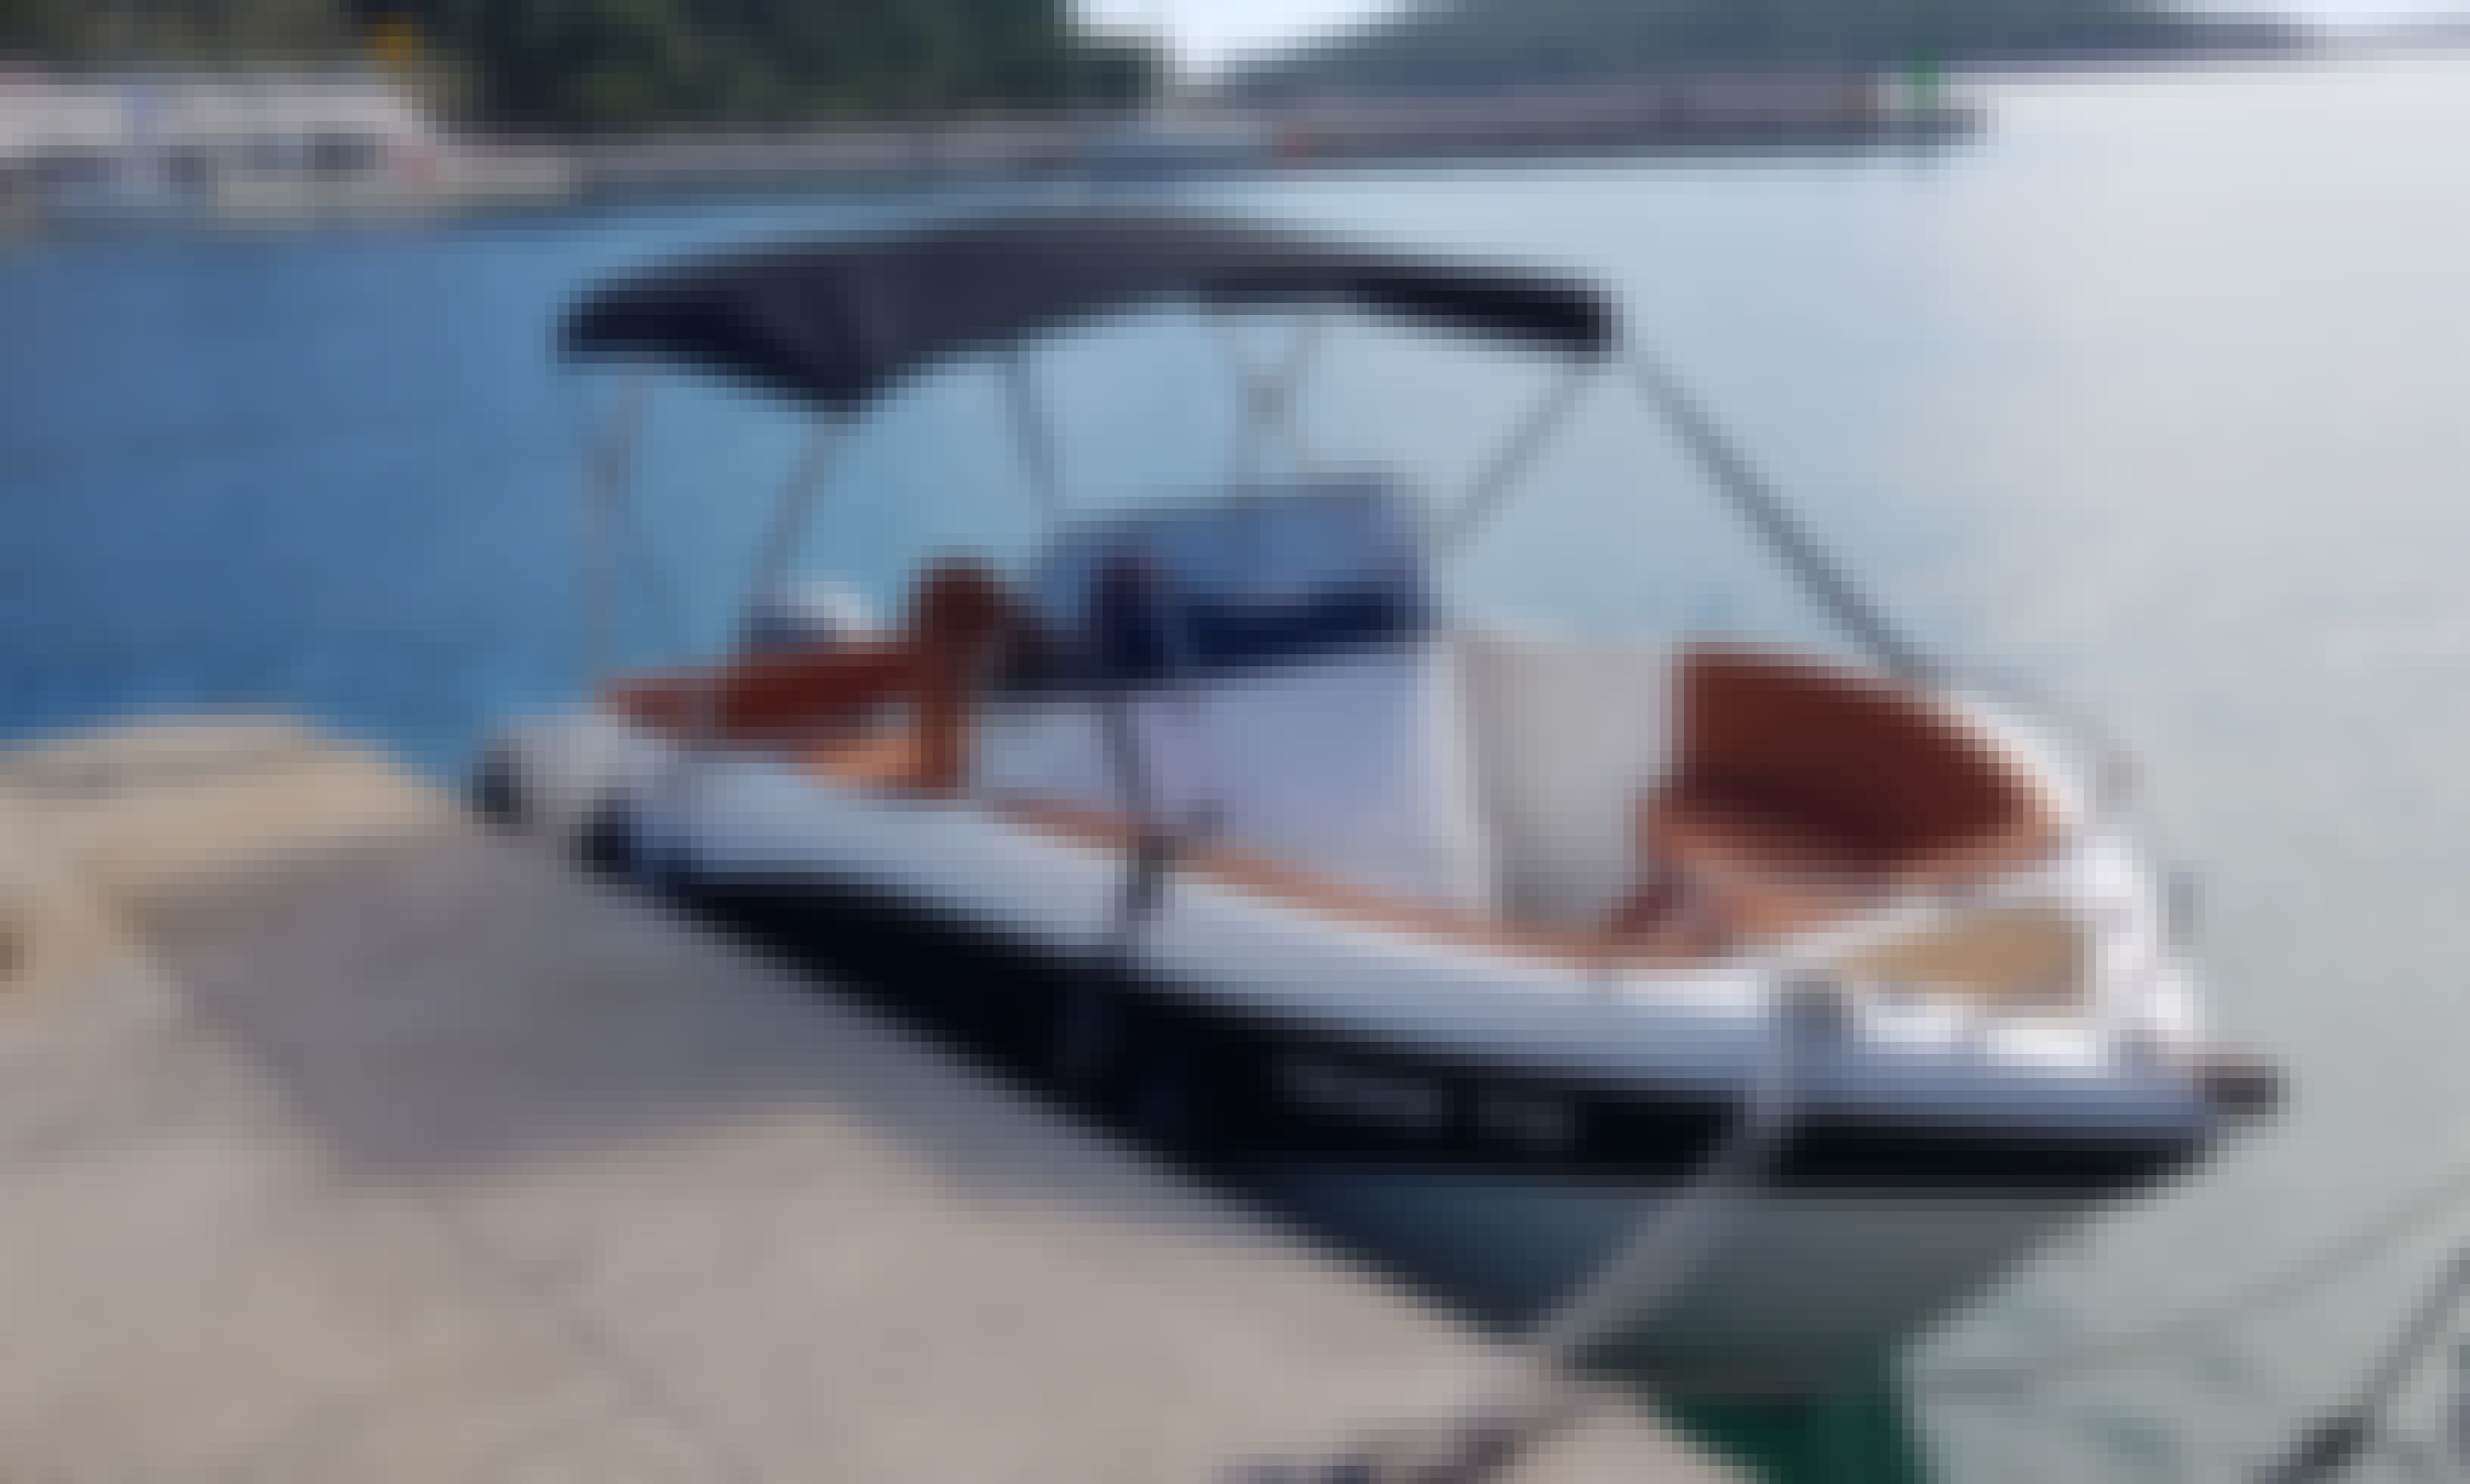 Barracuda 545 Speedboat, Trogir